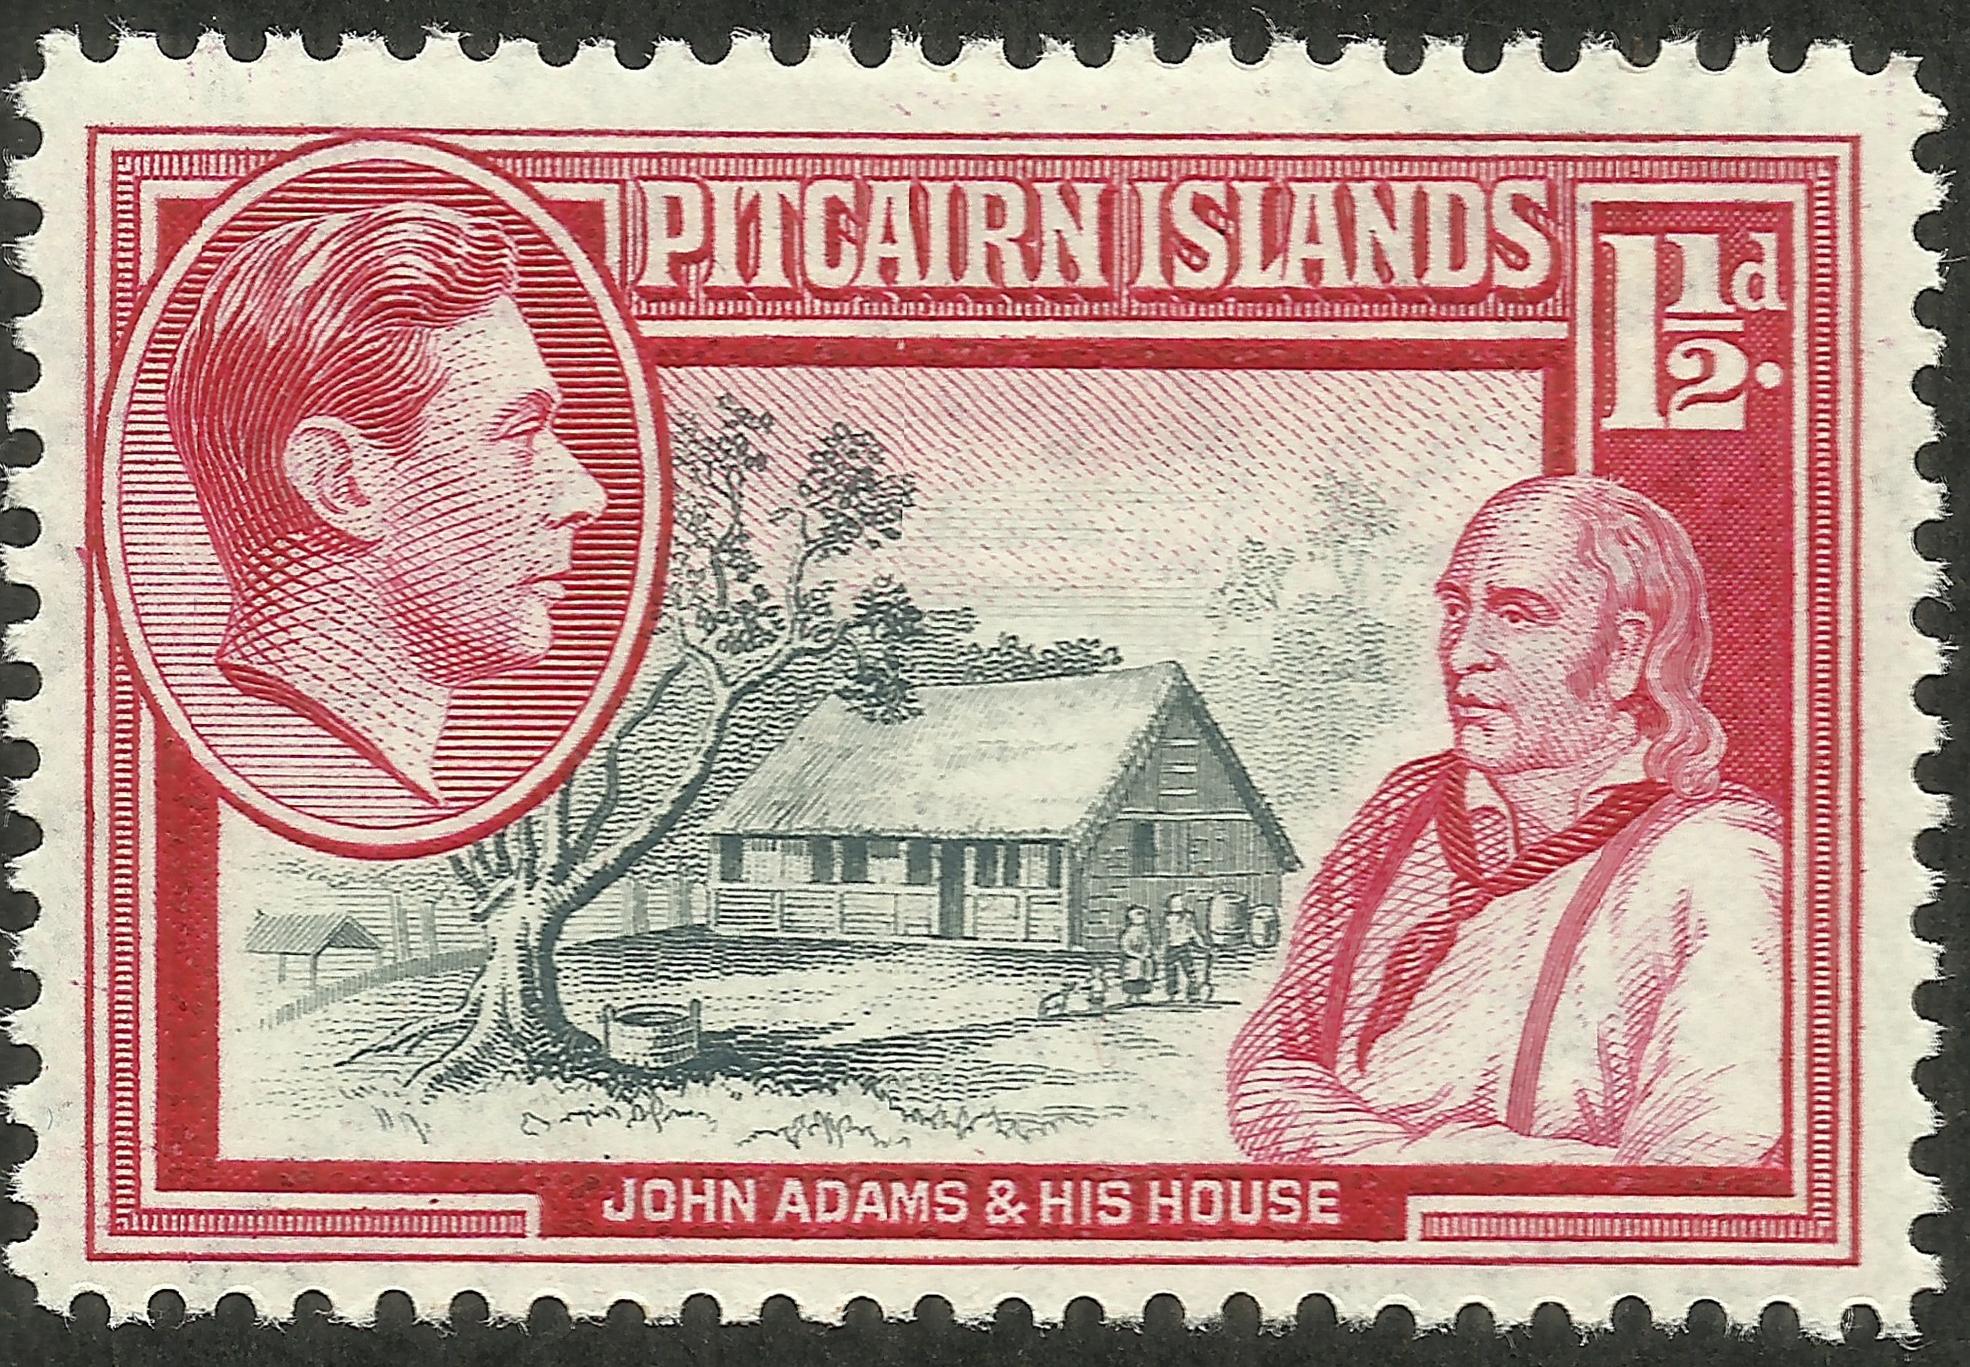 Pitcairn Islands - Scott #3 (1940). John Adams and his house on Pitcairn.